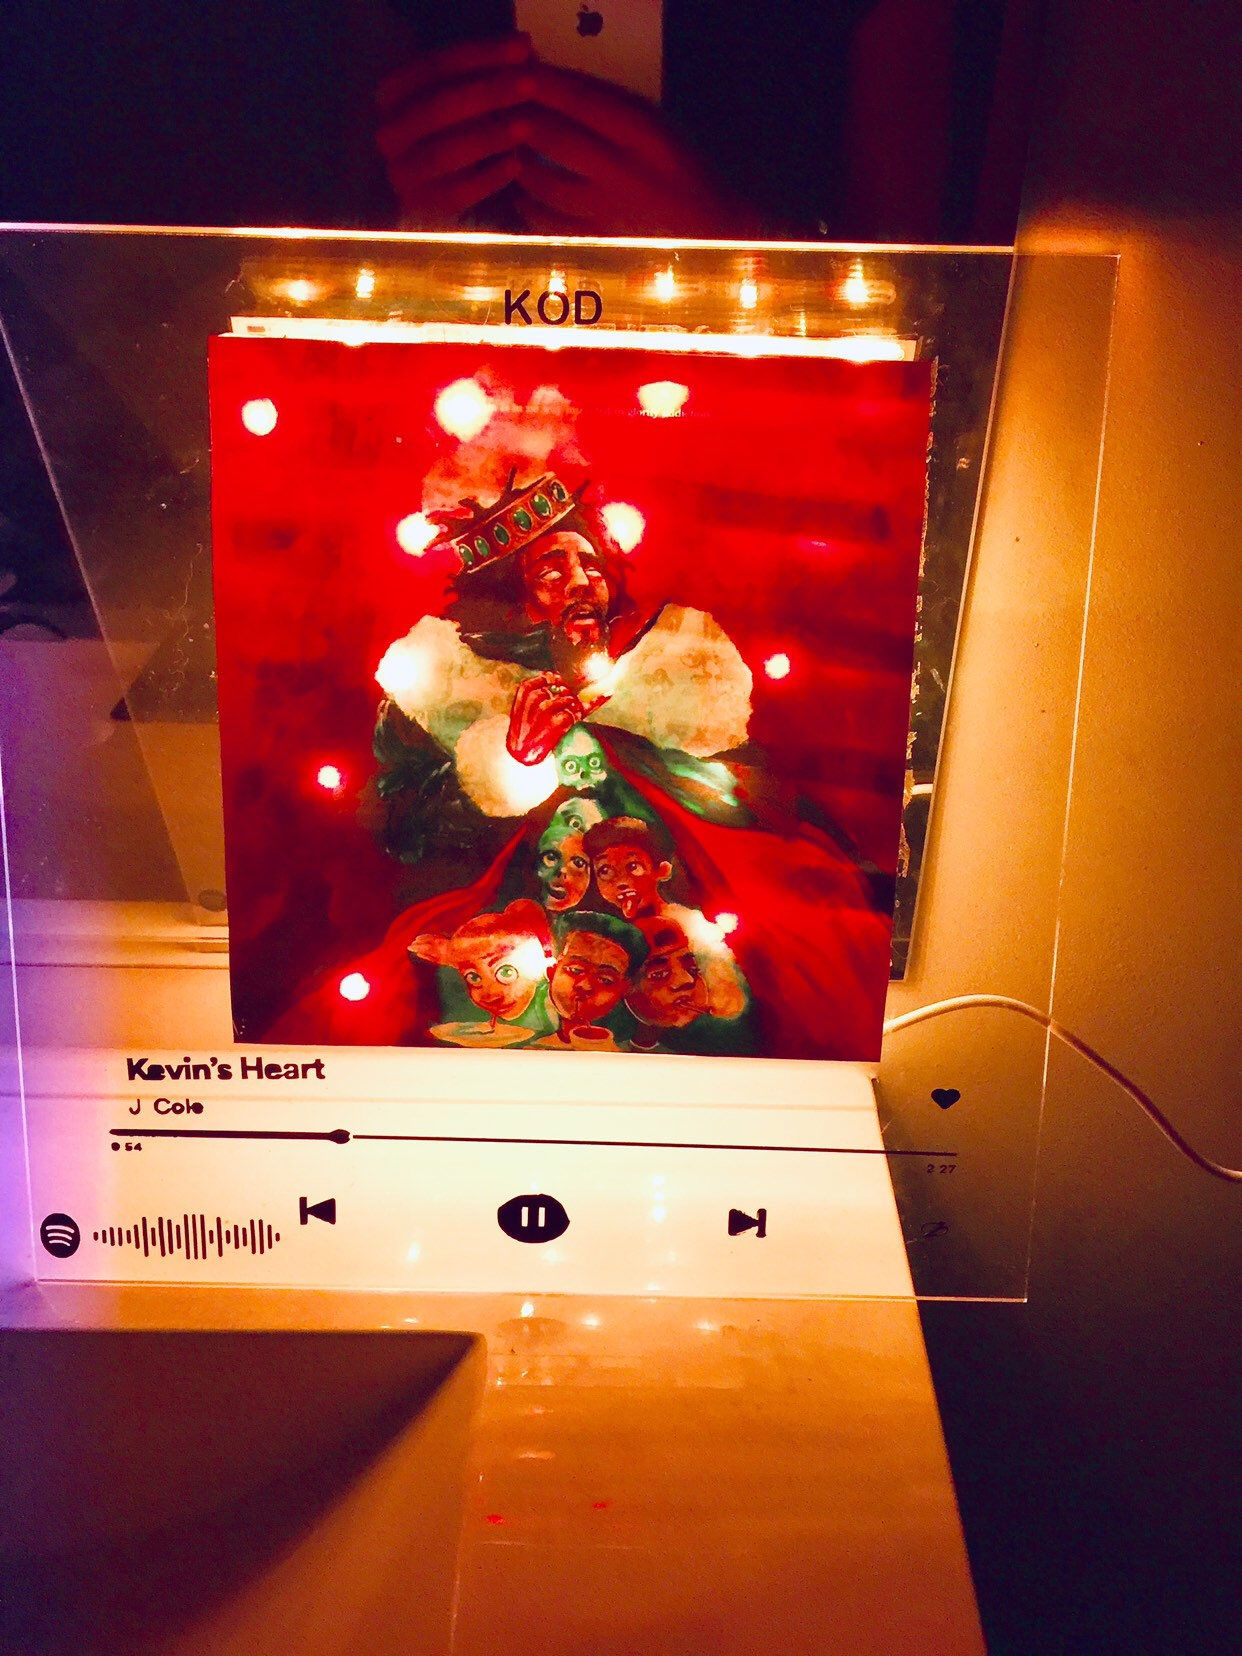 Custom song glass album cover album wall art WITH lights